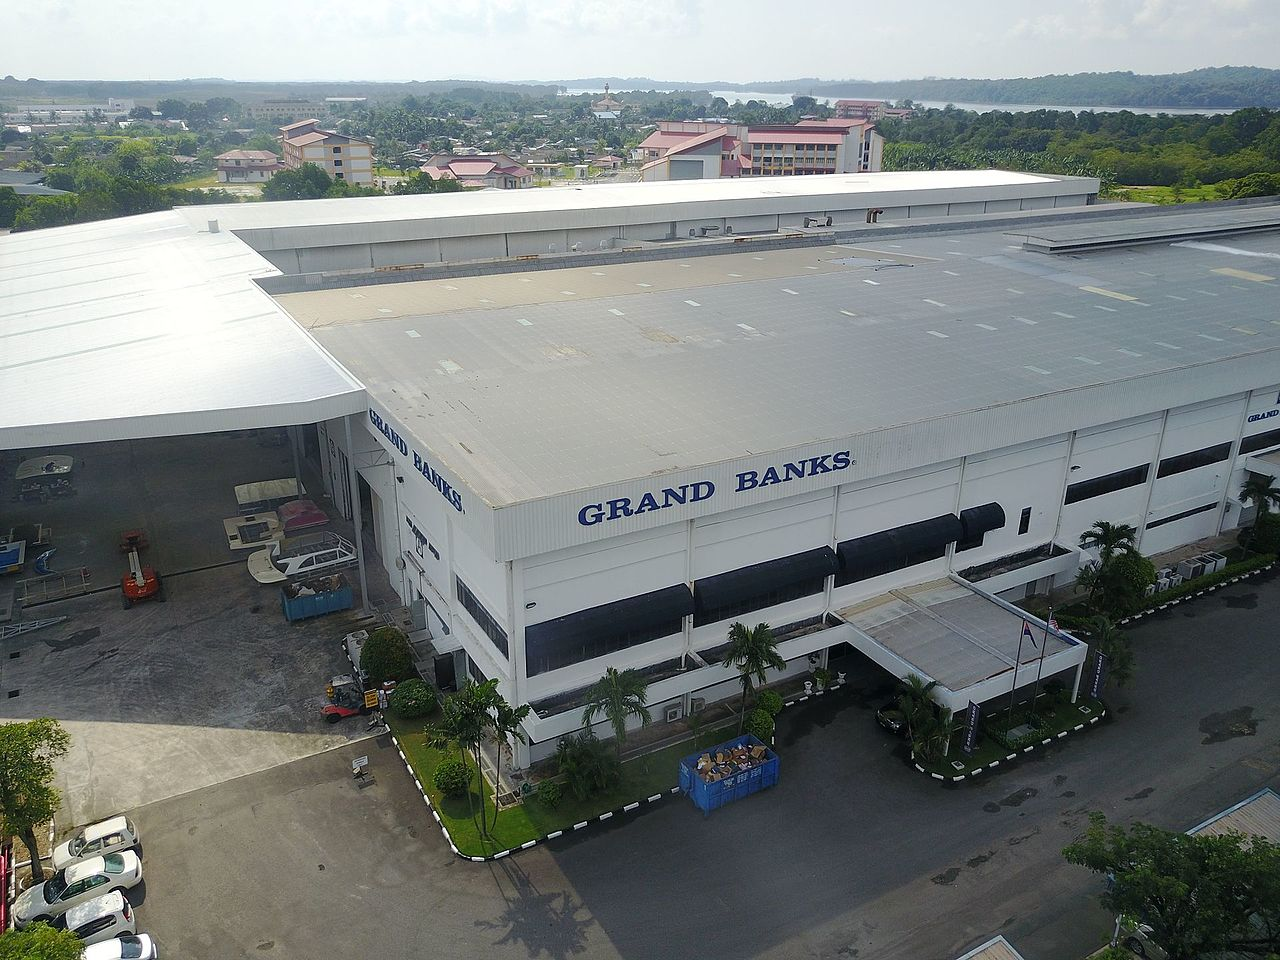 File:Grand Banks Yachts factory, Malaysia.jpg - Wikimedia